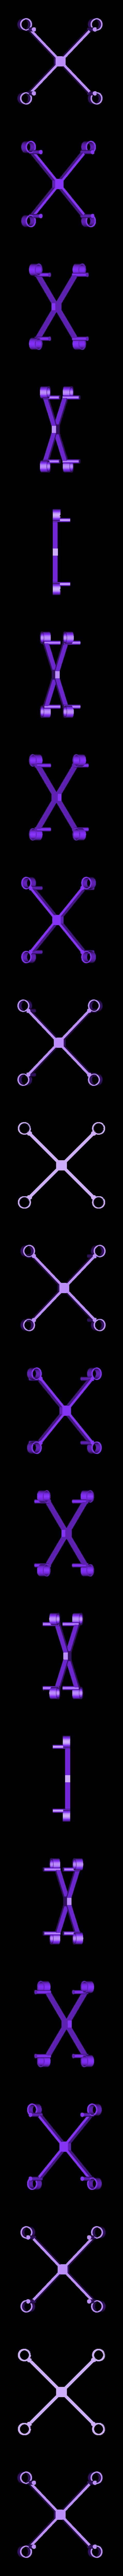 InductrixFrame_light2_gear.stl Download STL file Inductrix / Tiny Whoop light racing frame • 3D print design, Mr_Disintegrator